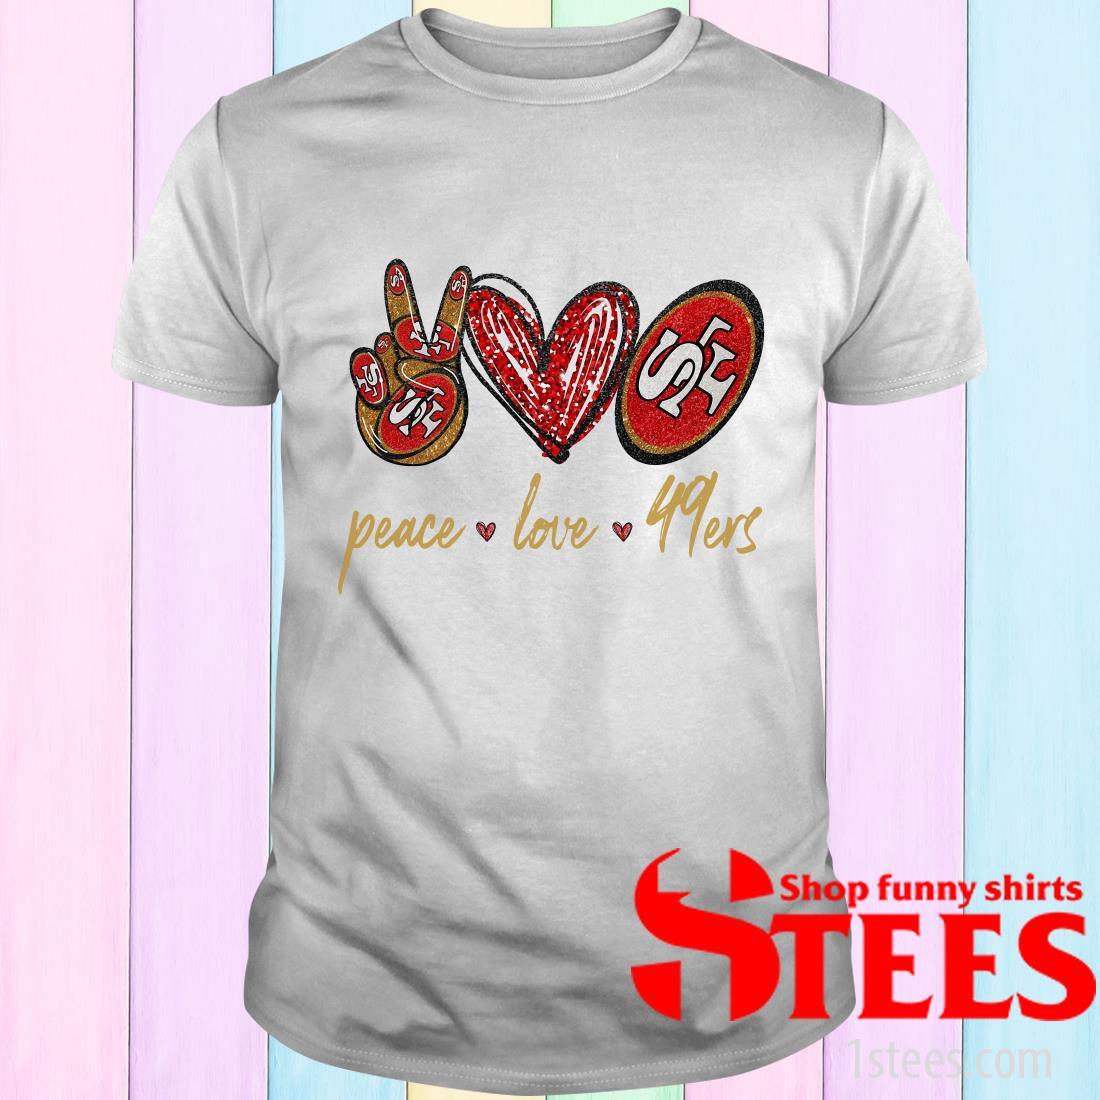 Peace Love San Francisco 49ers T-Shirt